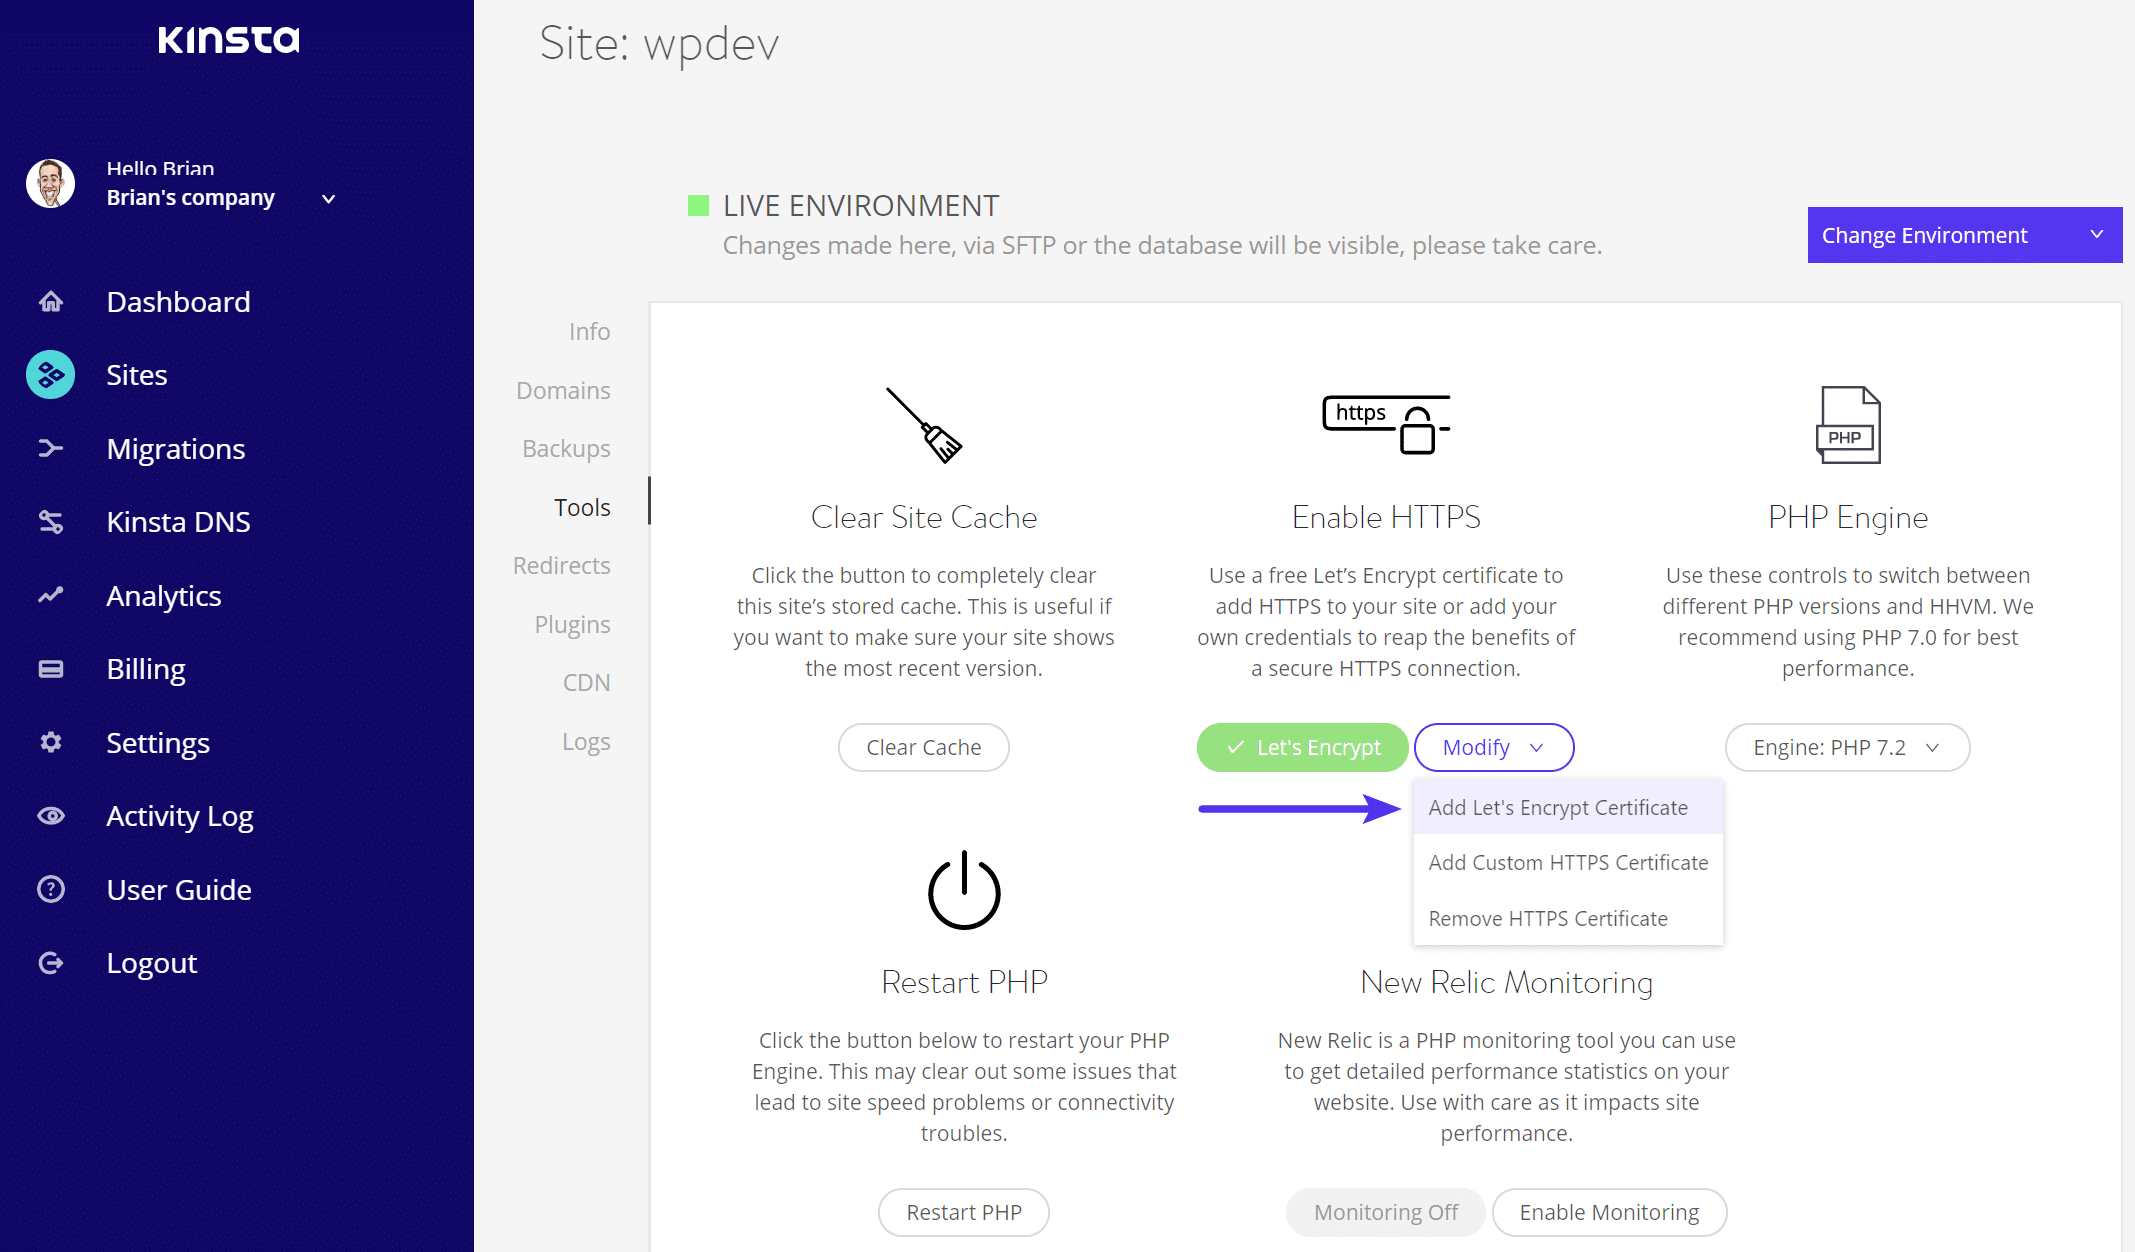 Füge SSL hinzu (Let's Encrypt)